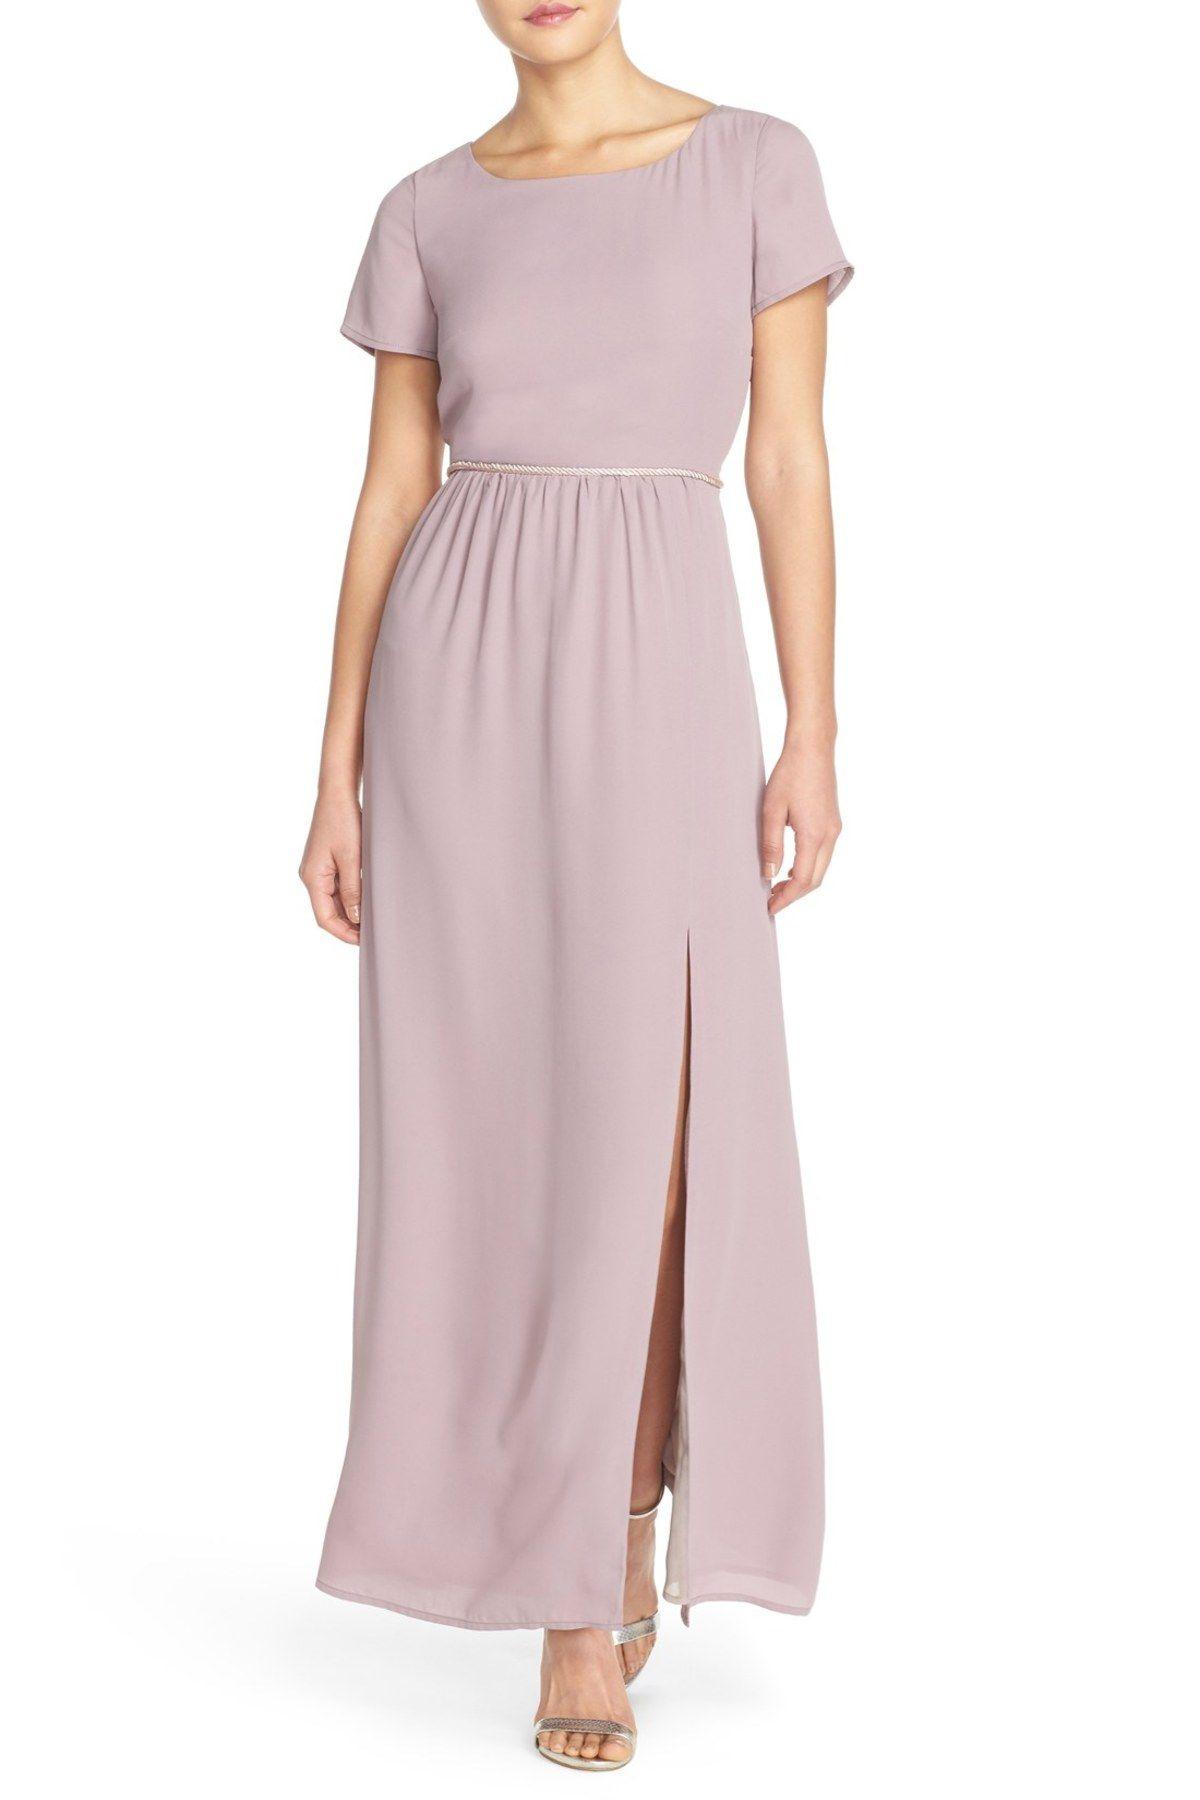 by Lauren Conrad 'Shreveport' Side Slit A-Line Crepe Gown